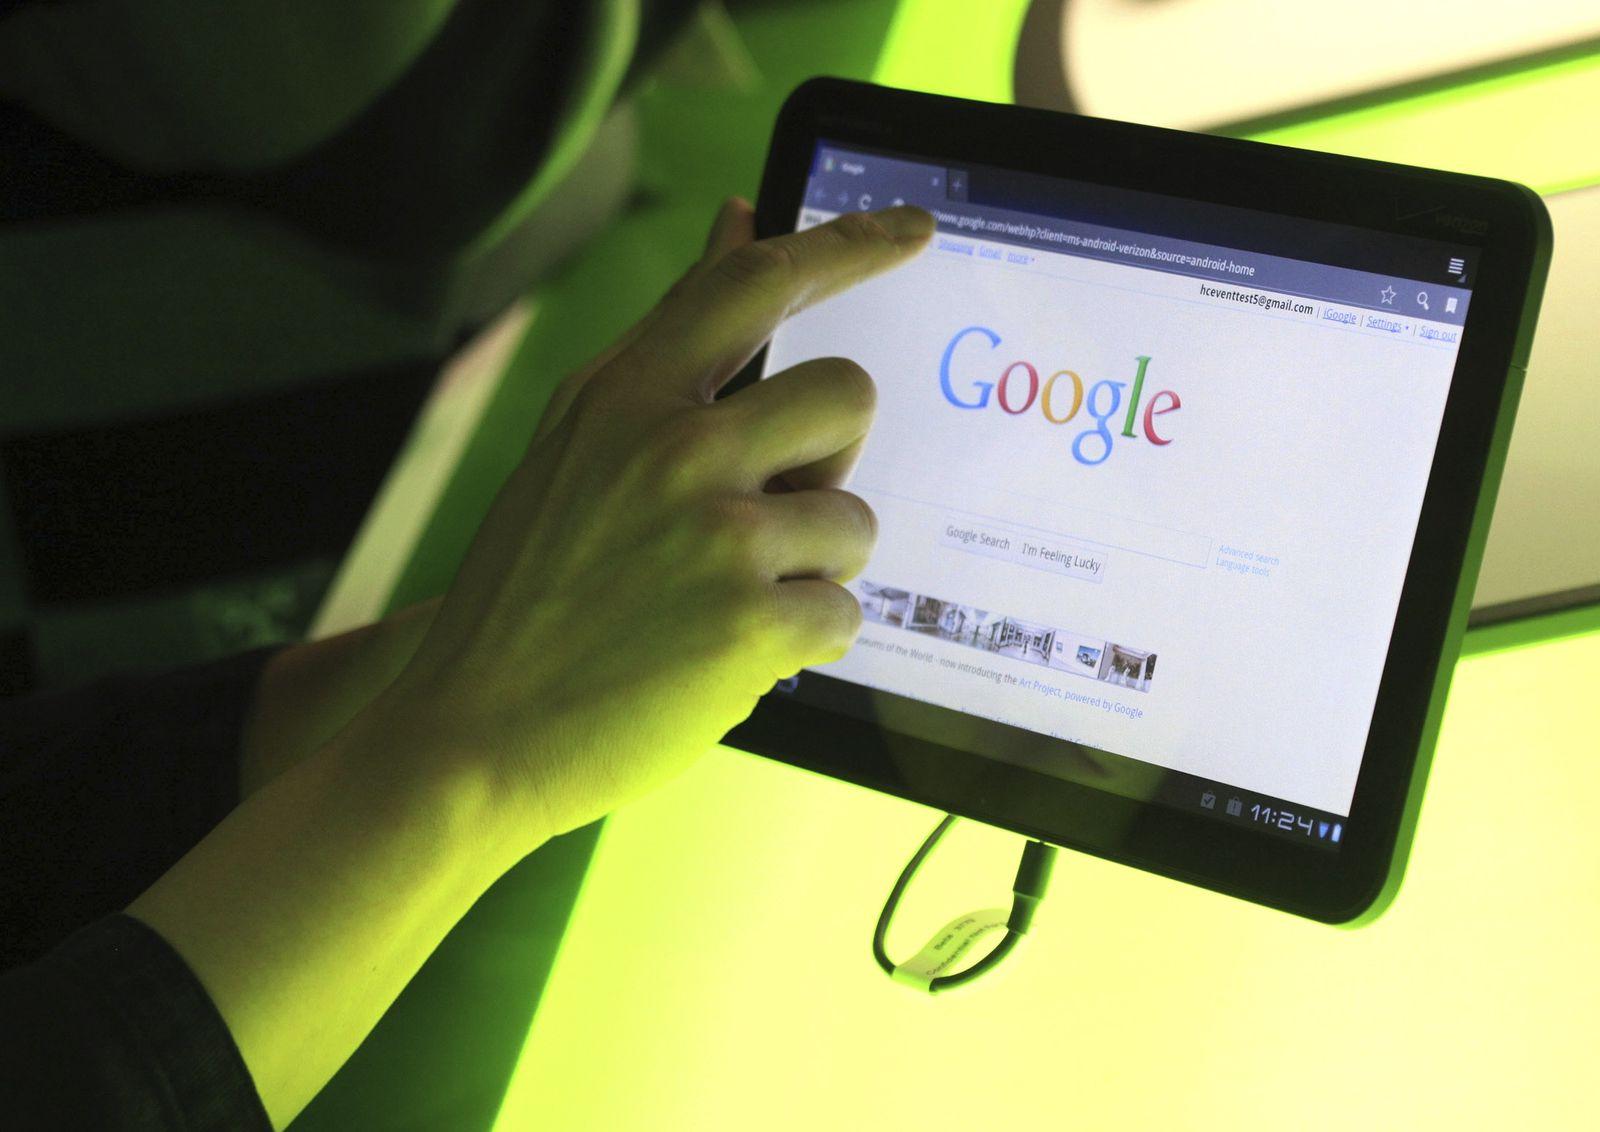 THEMEN Google / Android Betriebssystem